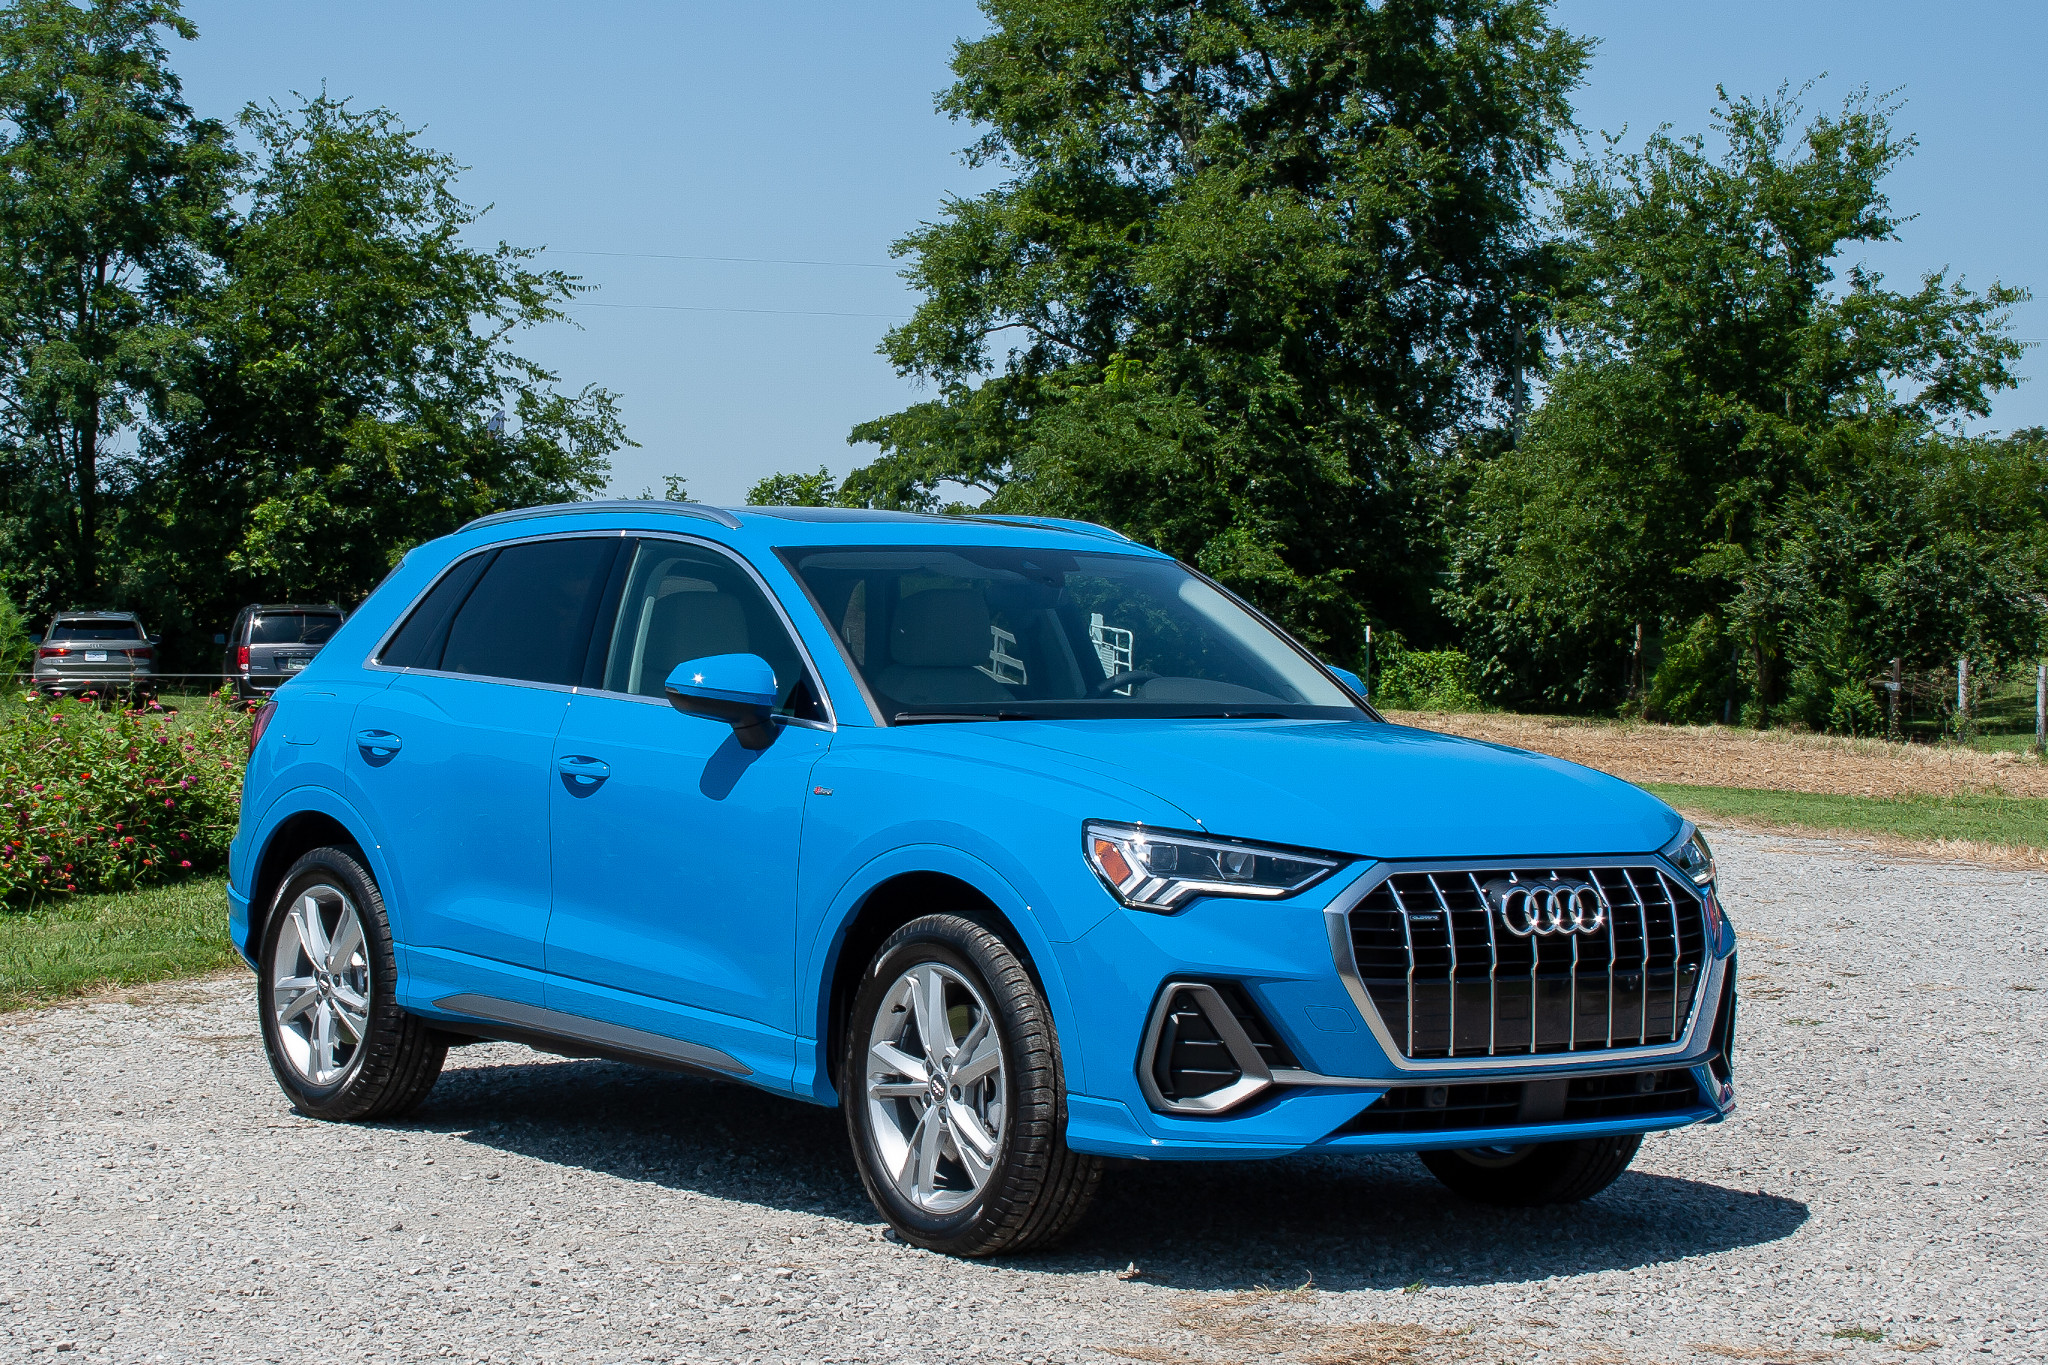 2019 Audi Q3 Video: Q3 Makes Luxury First Impressions